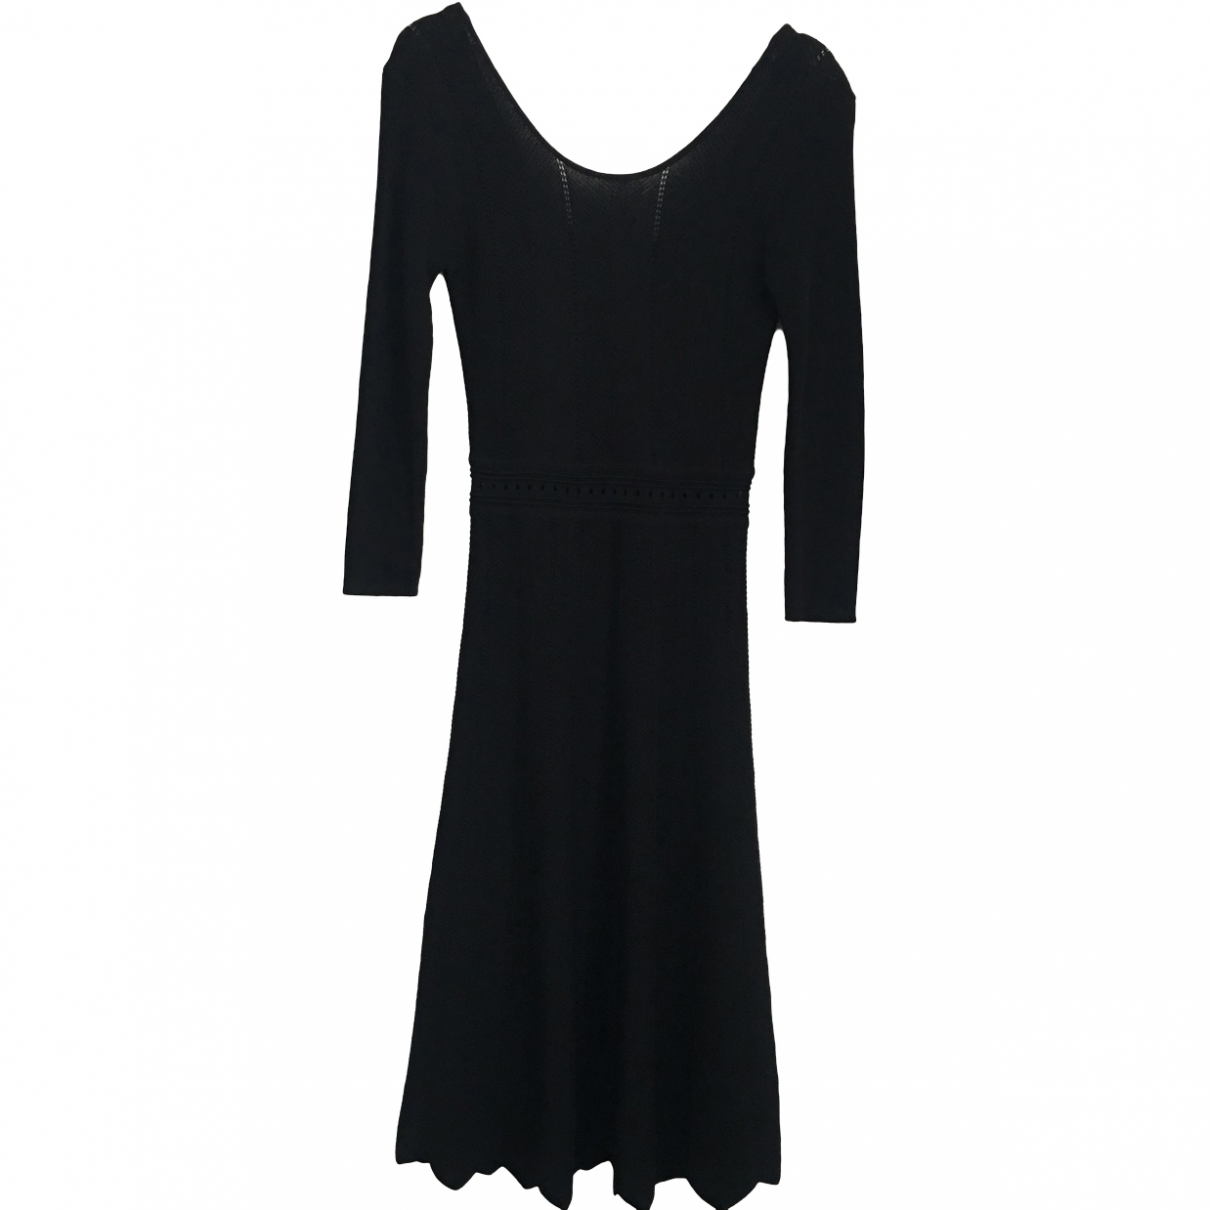 Claudie Pierlot \N Black dress for Women 2 0-5